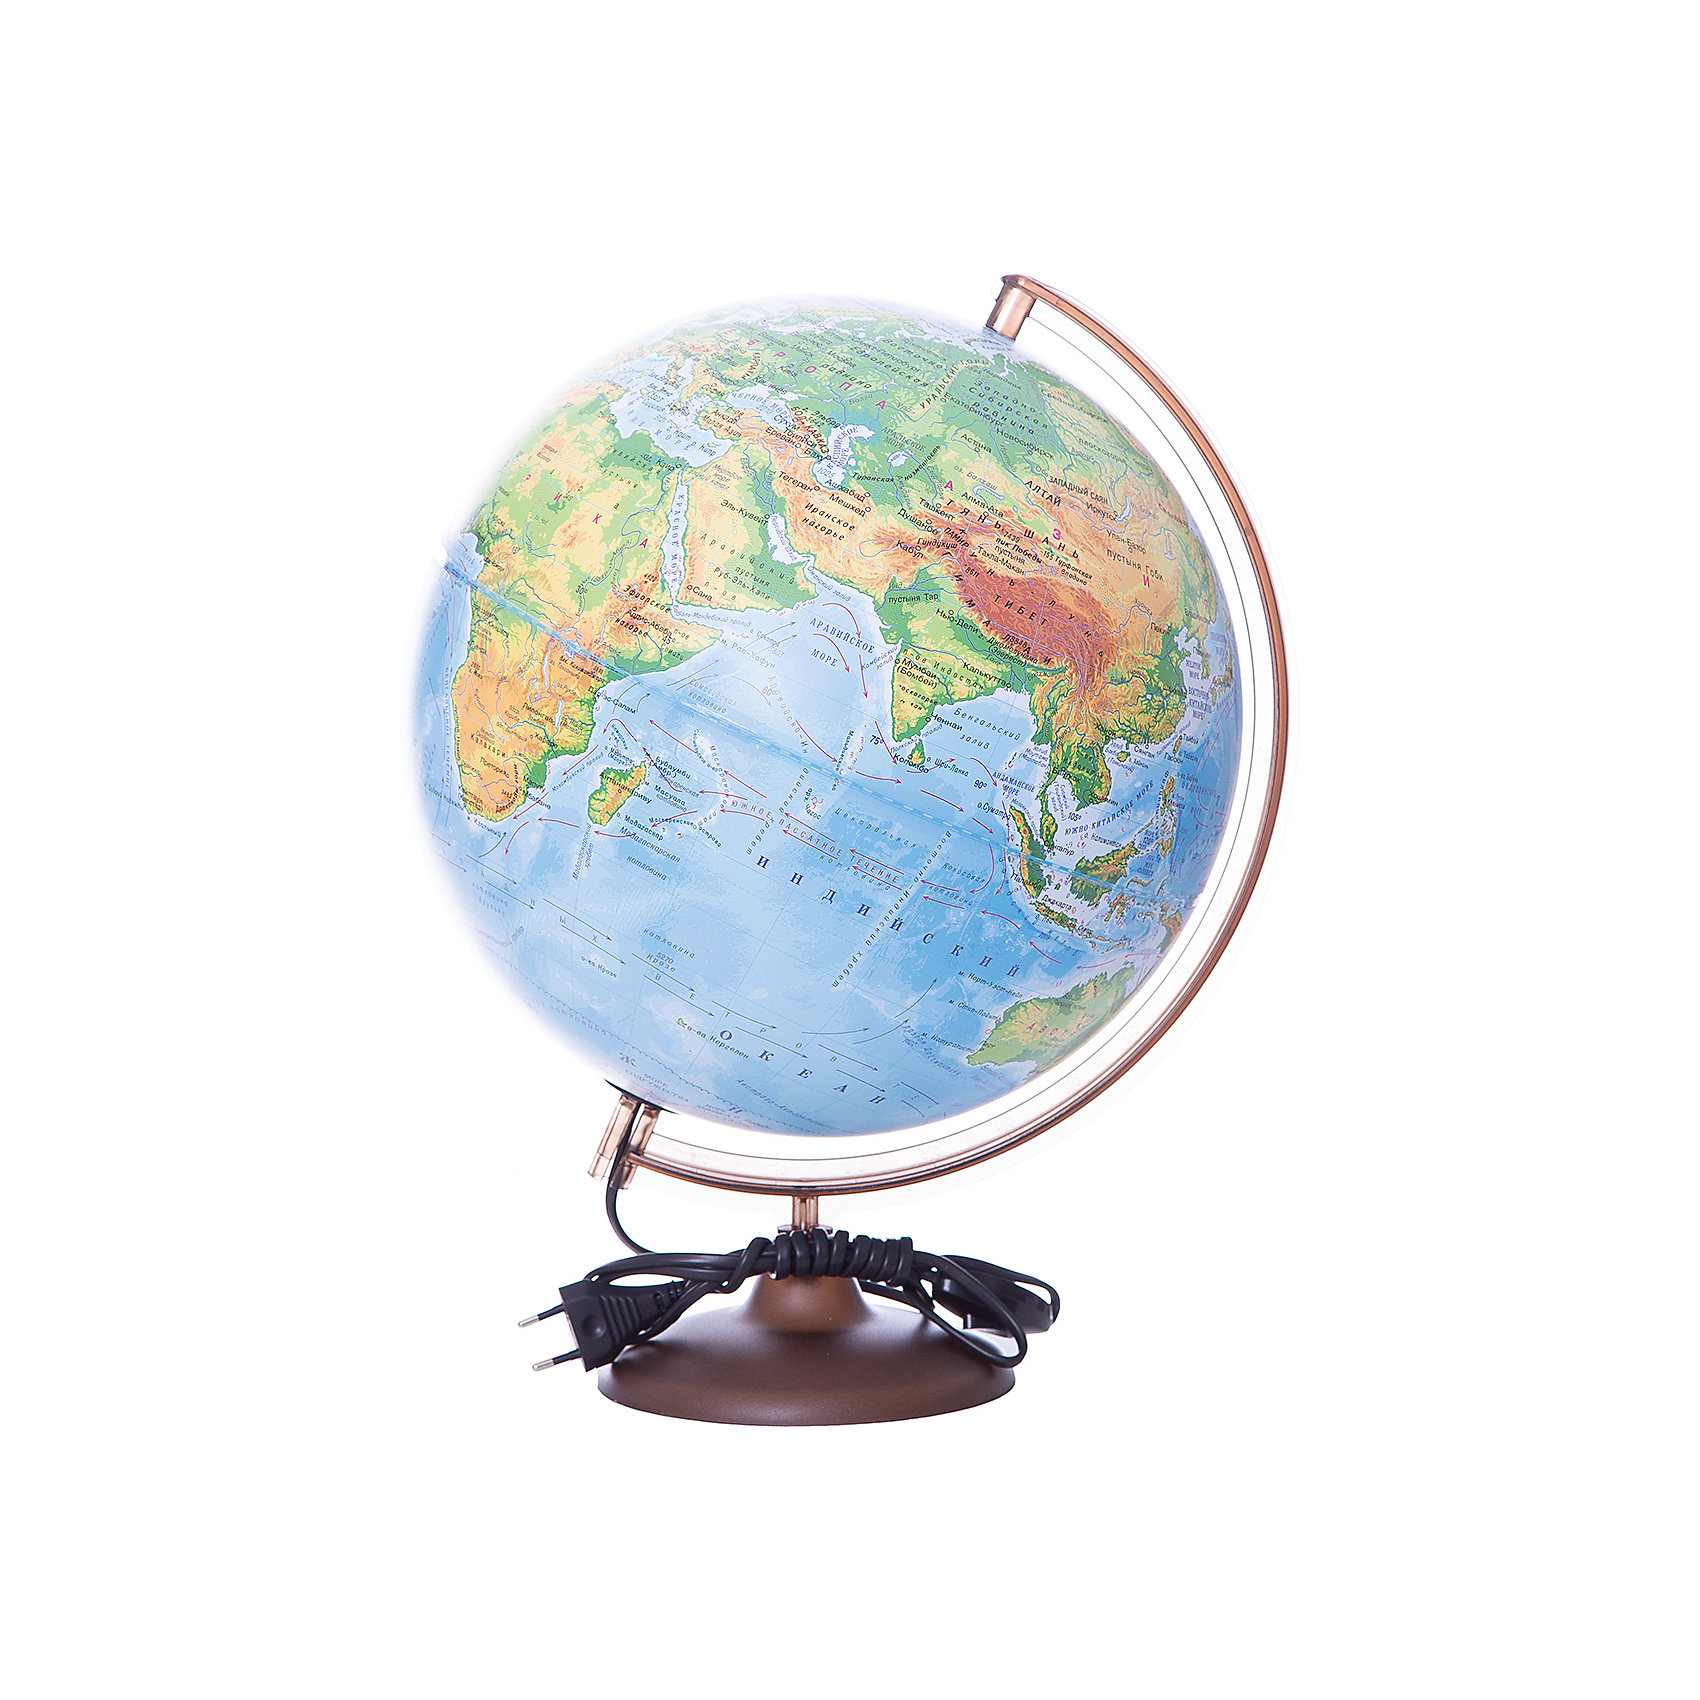 Глобус Земли физический с подсветкой, диаметр 320 ммДиаметр: 320 мм<br><br>Масштаб: 1:40000000<br><br>Материал подставки: Пластик<br><br>Цвет подставки: Черный<br><br>Размер коробки: 343х343х355 мм.<br><br>Ширина мм: 343<br>Глубина мм: 343<br>Высота мм: 355<br>Вес г: 1025<br>Возраст от месяцев: 72<br>Возраст до месяцев: 2147483647<br>Пол: Унисекс<br>Возраст: Детский<br>SKU: 5518200